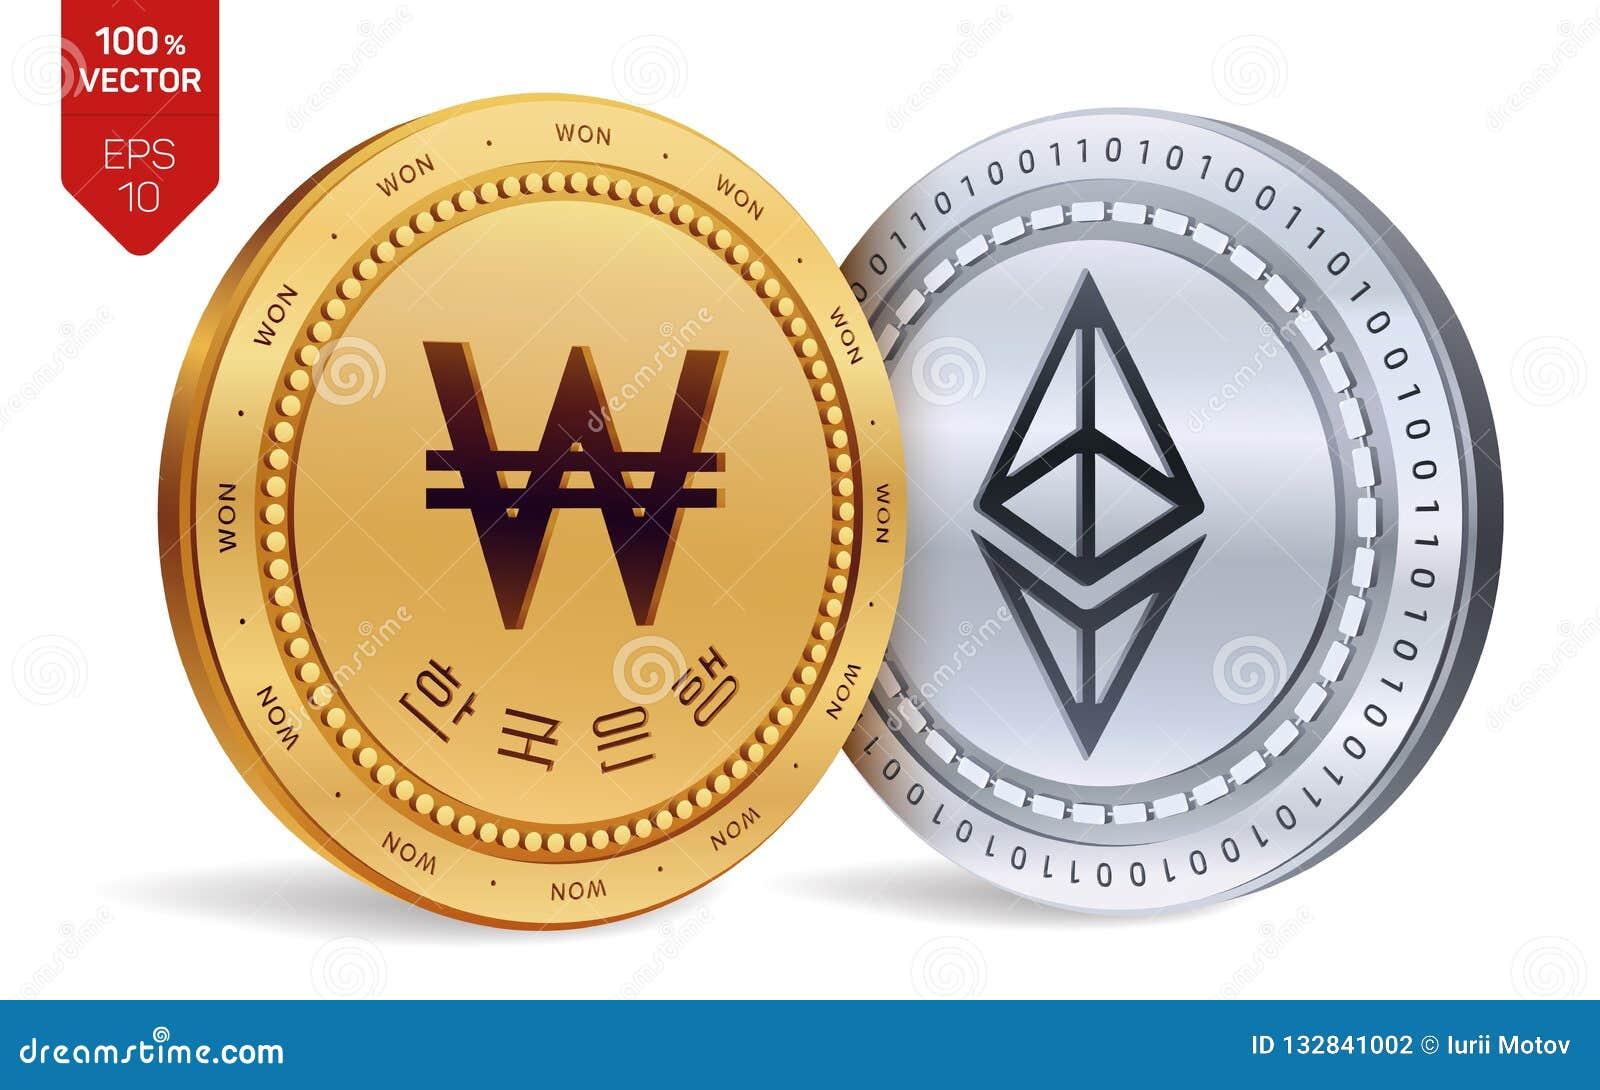 Ethereum  Won  3D Isometric Physical Coins  Korea Won Coin